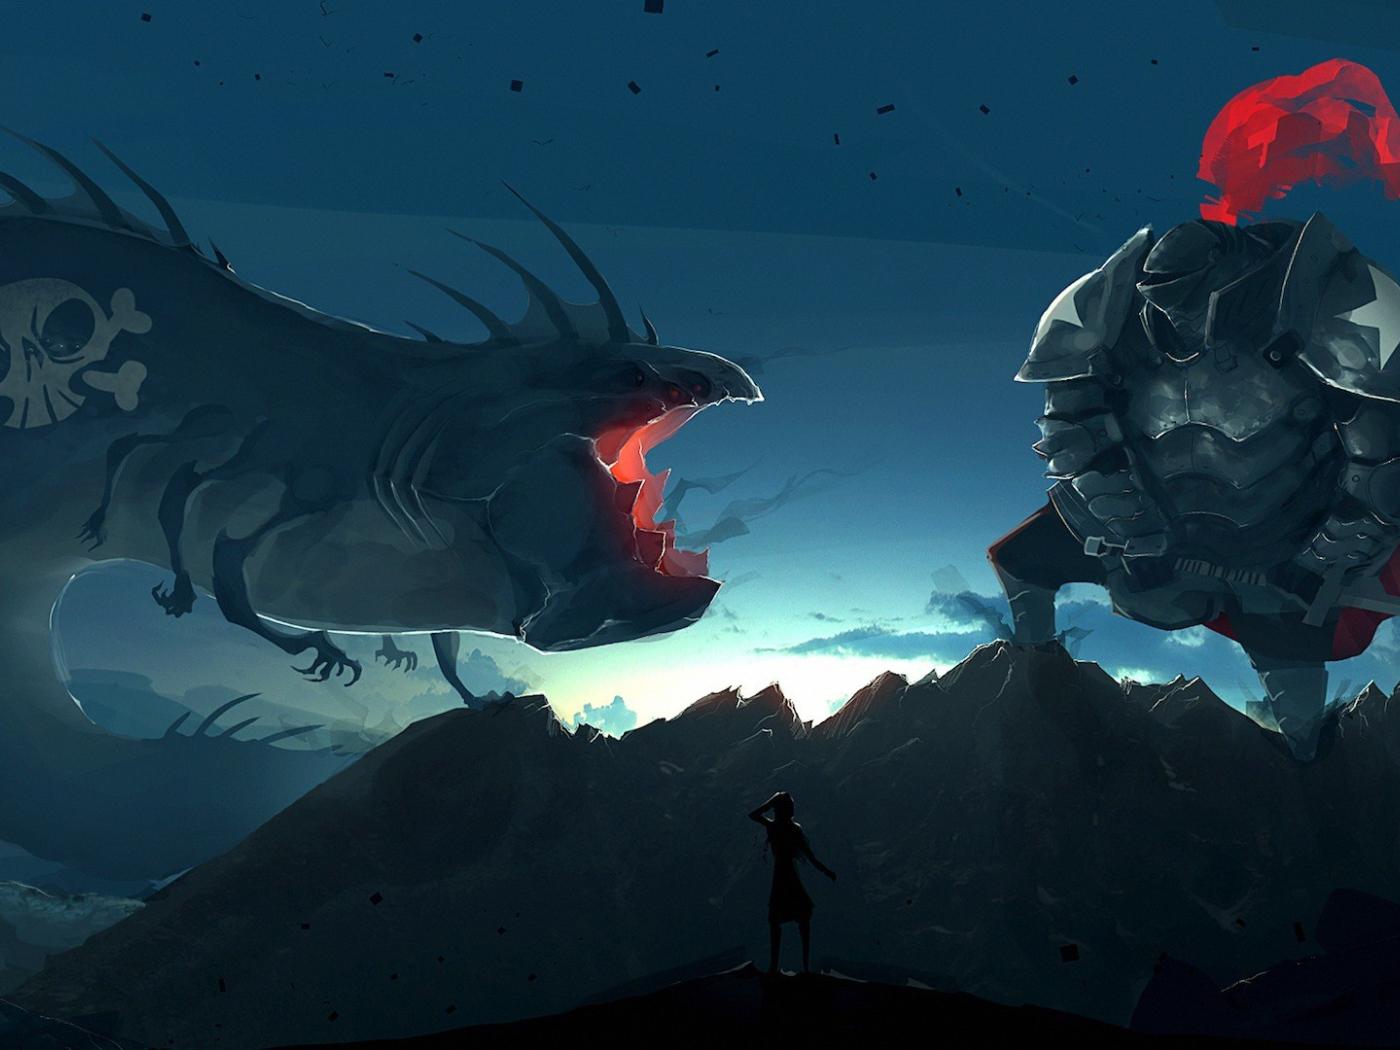 Battle With Giant Monster Desktop Wallpapers 1400x1050